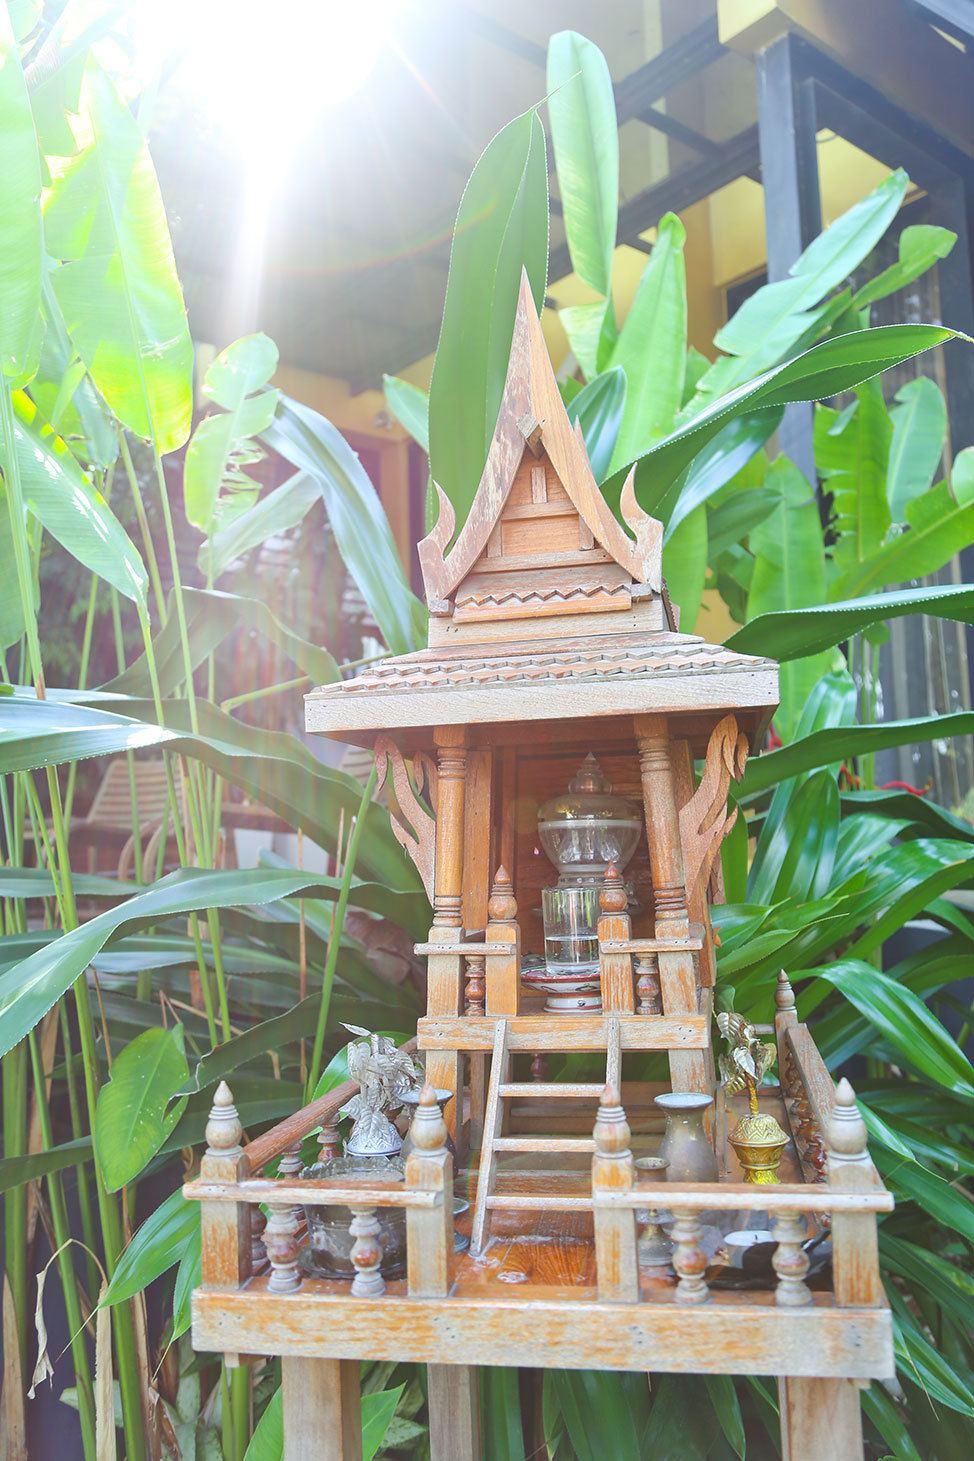 Iudia Hotel, Ayutthaya, Thailand